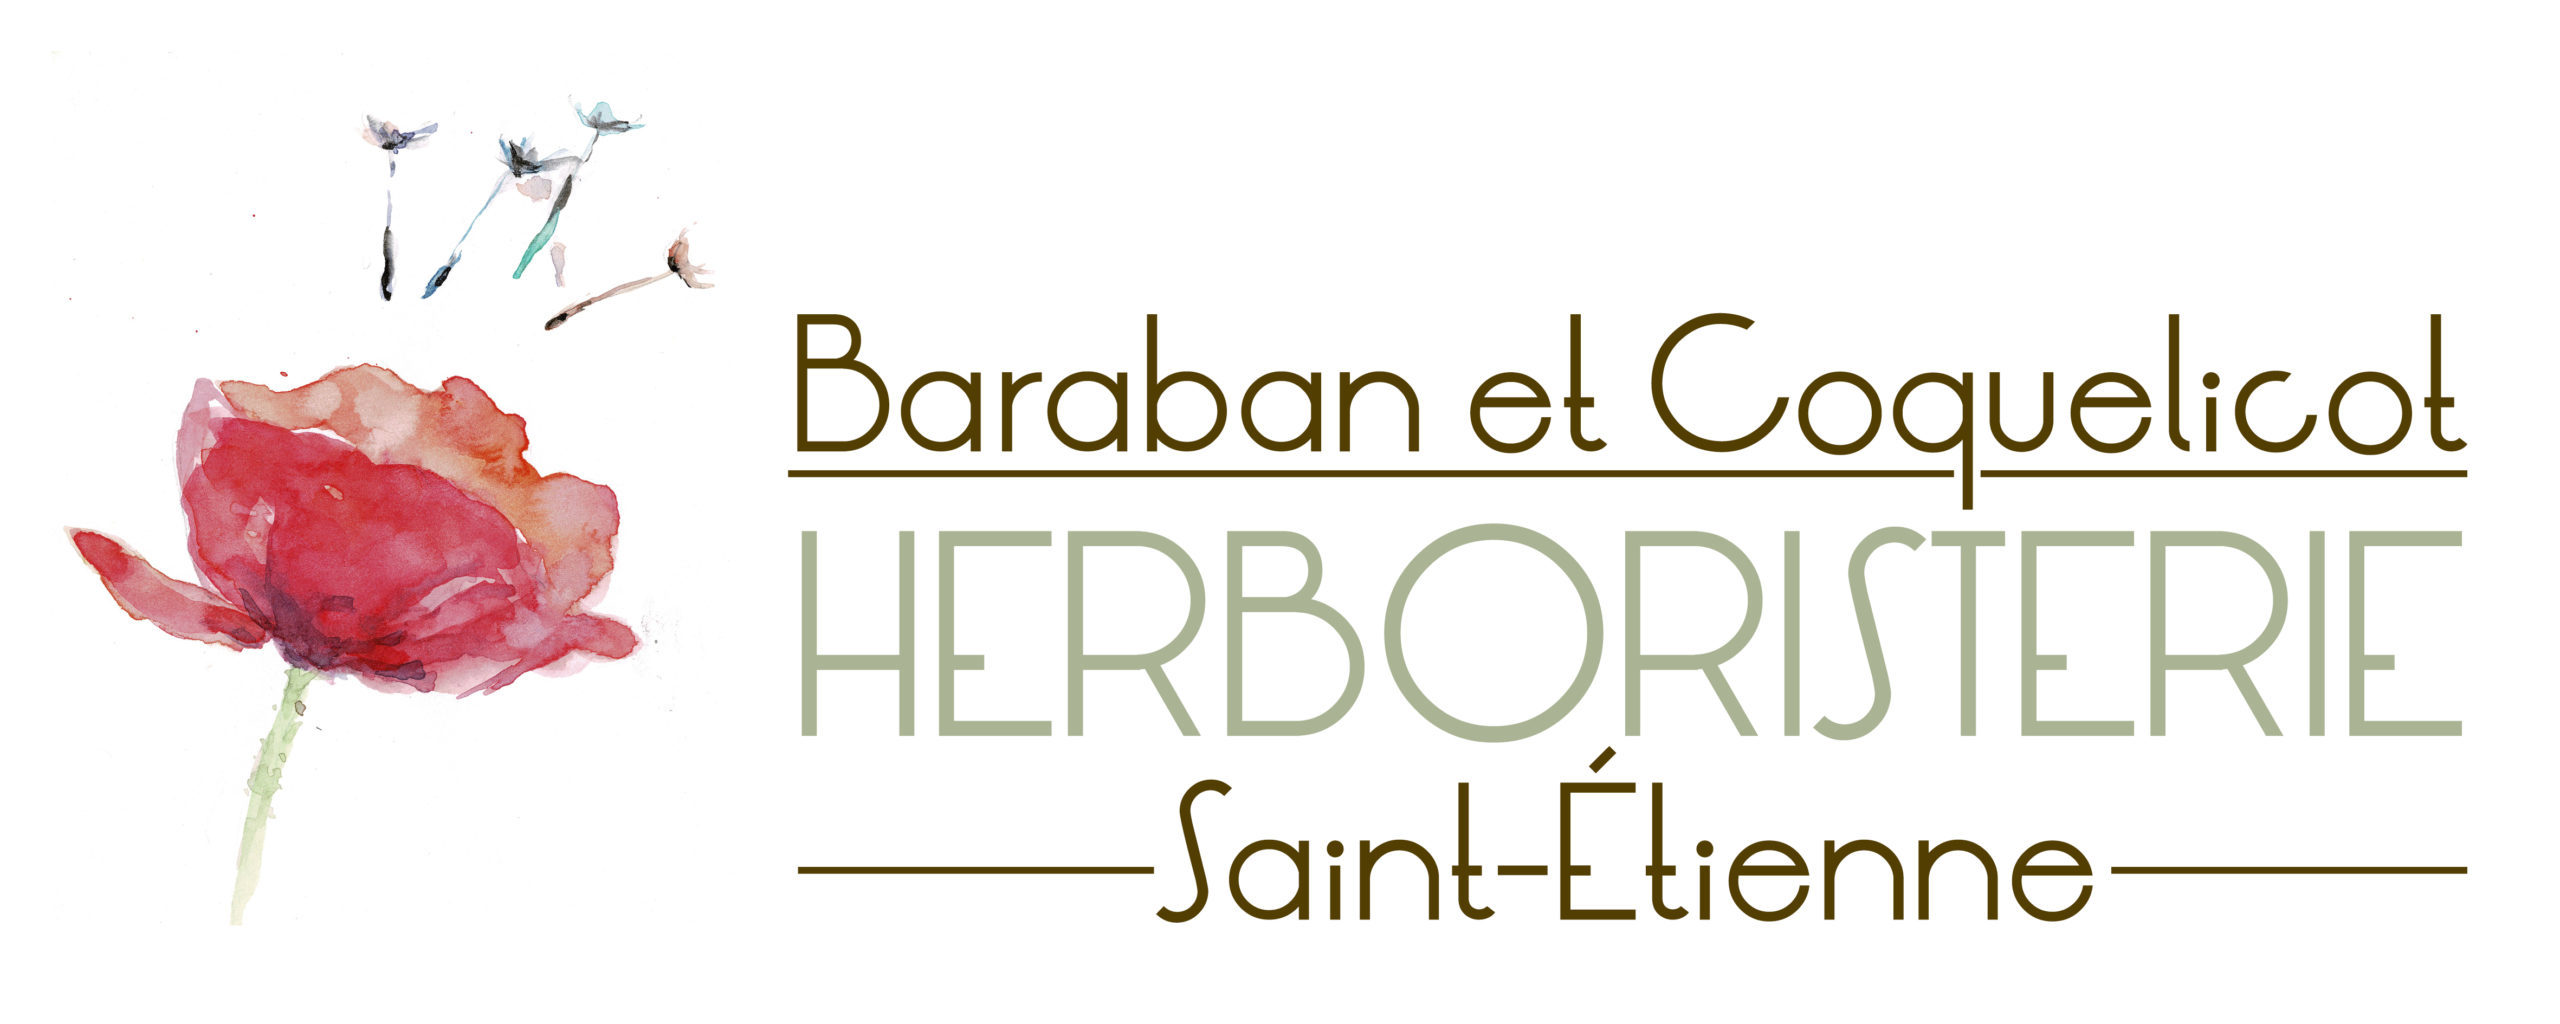 Baraban et Coquelicot